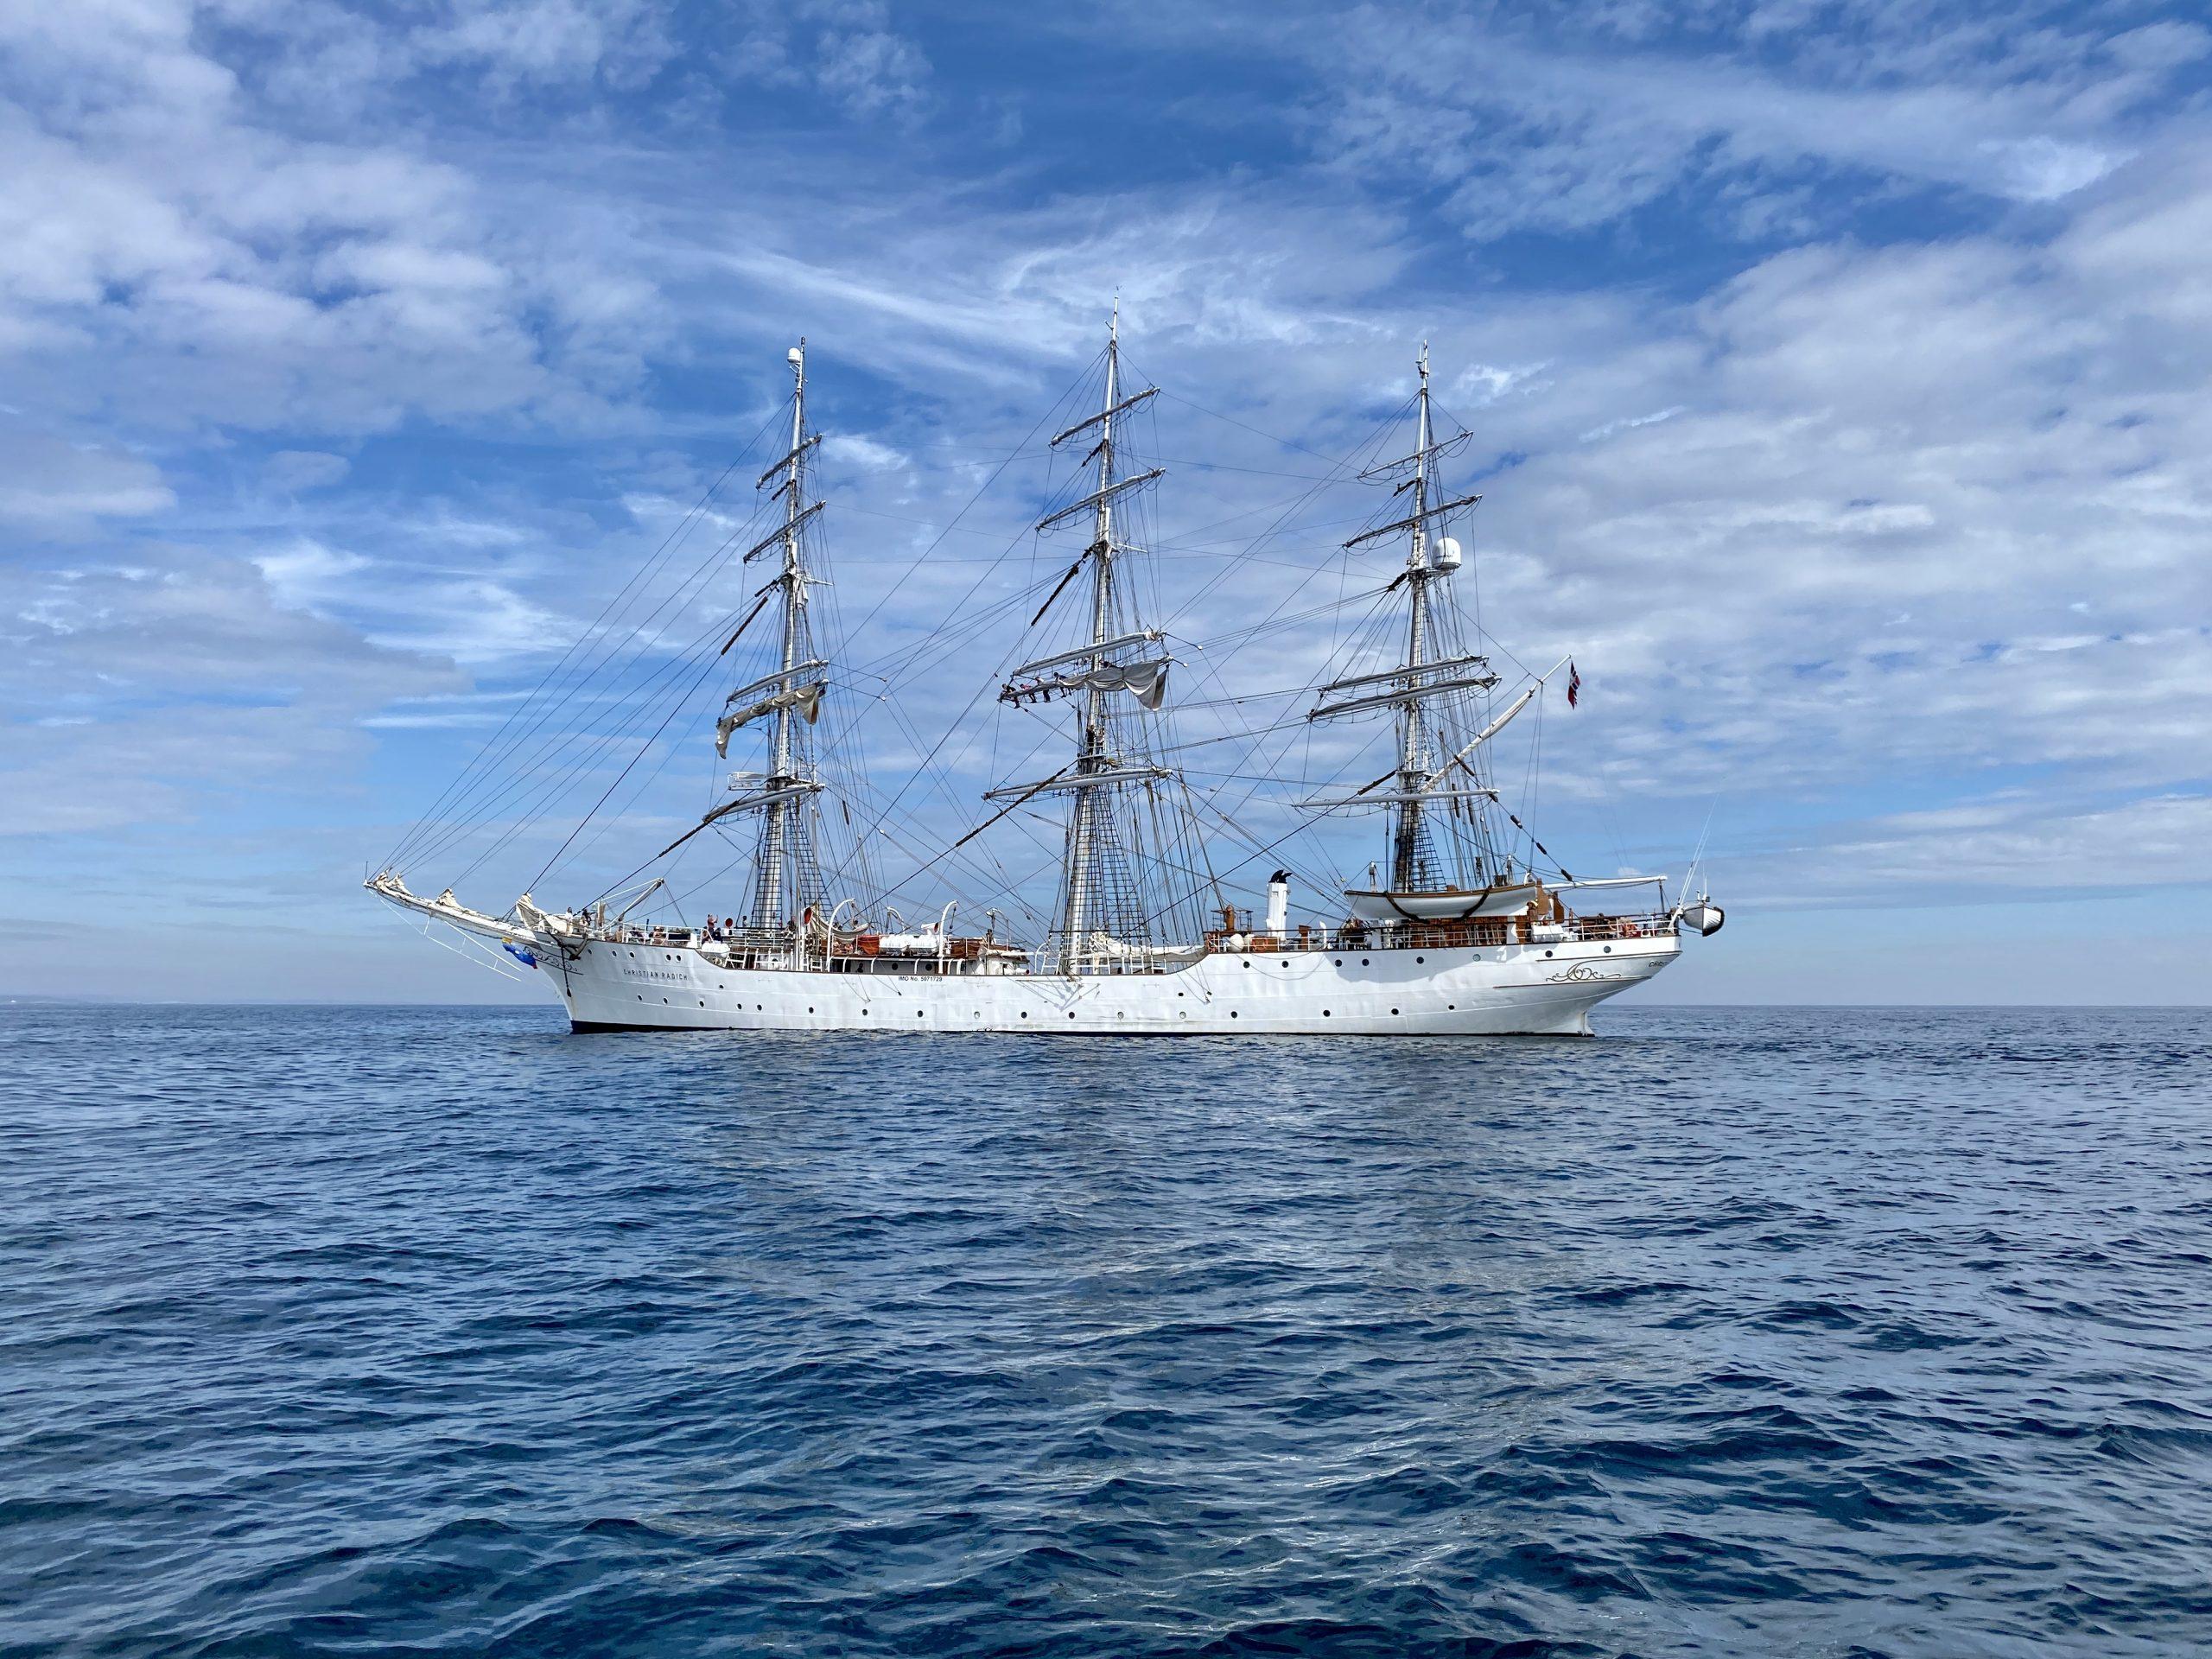 A Coruña Lisbon Tall Ships Races Magellan Elcano Christian Radich